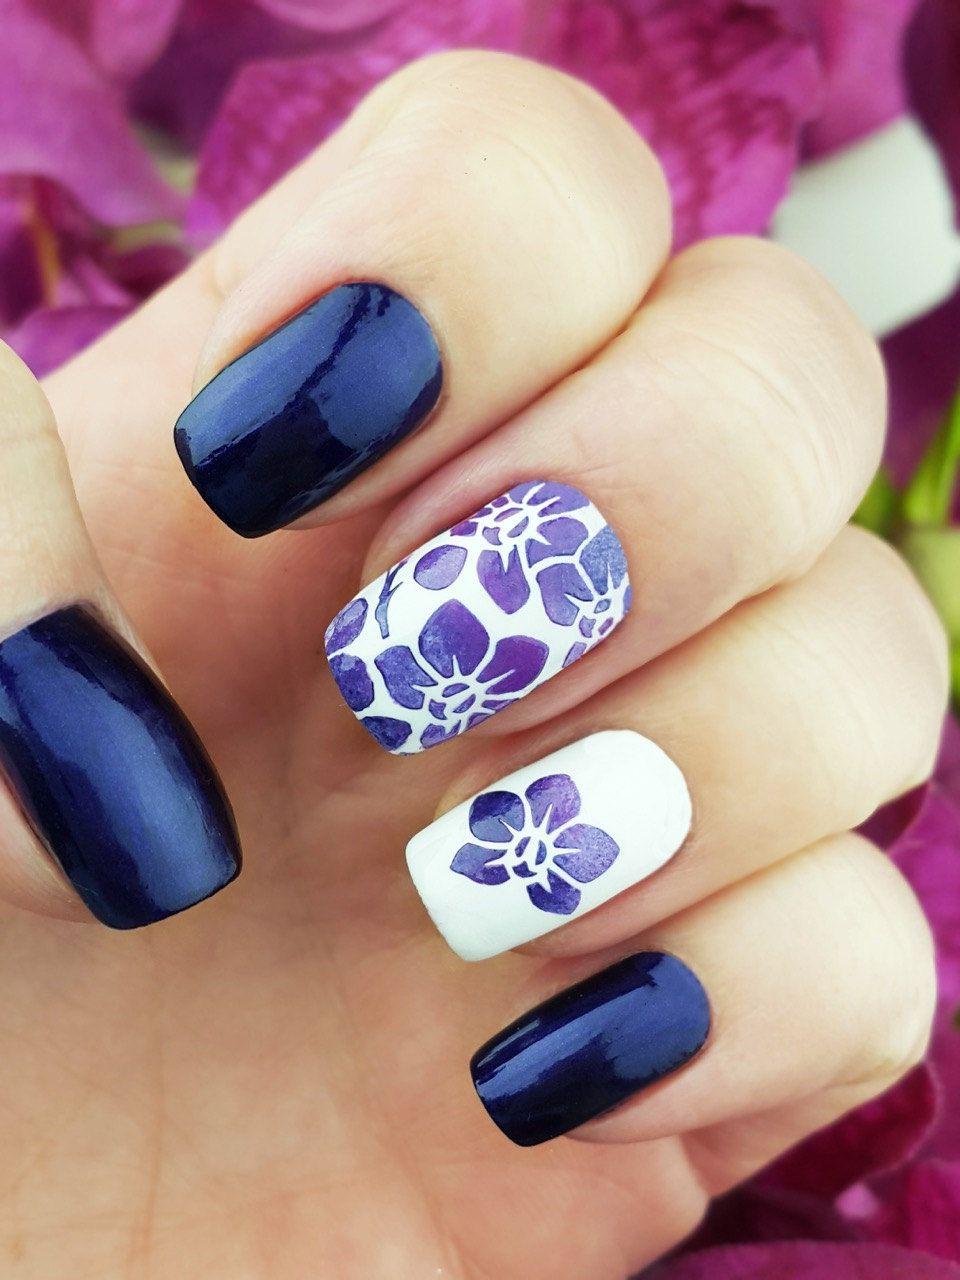 Orchids Nail Art Stencils incredible nail art vinyls by by Unail ...